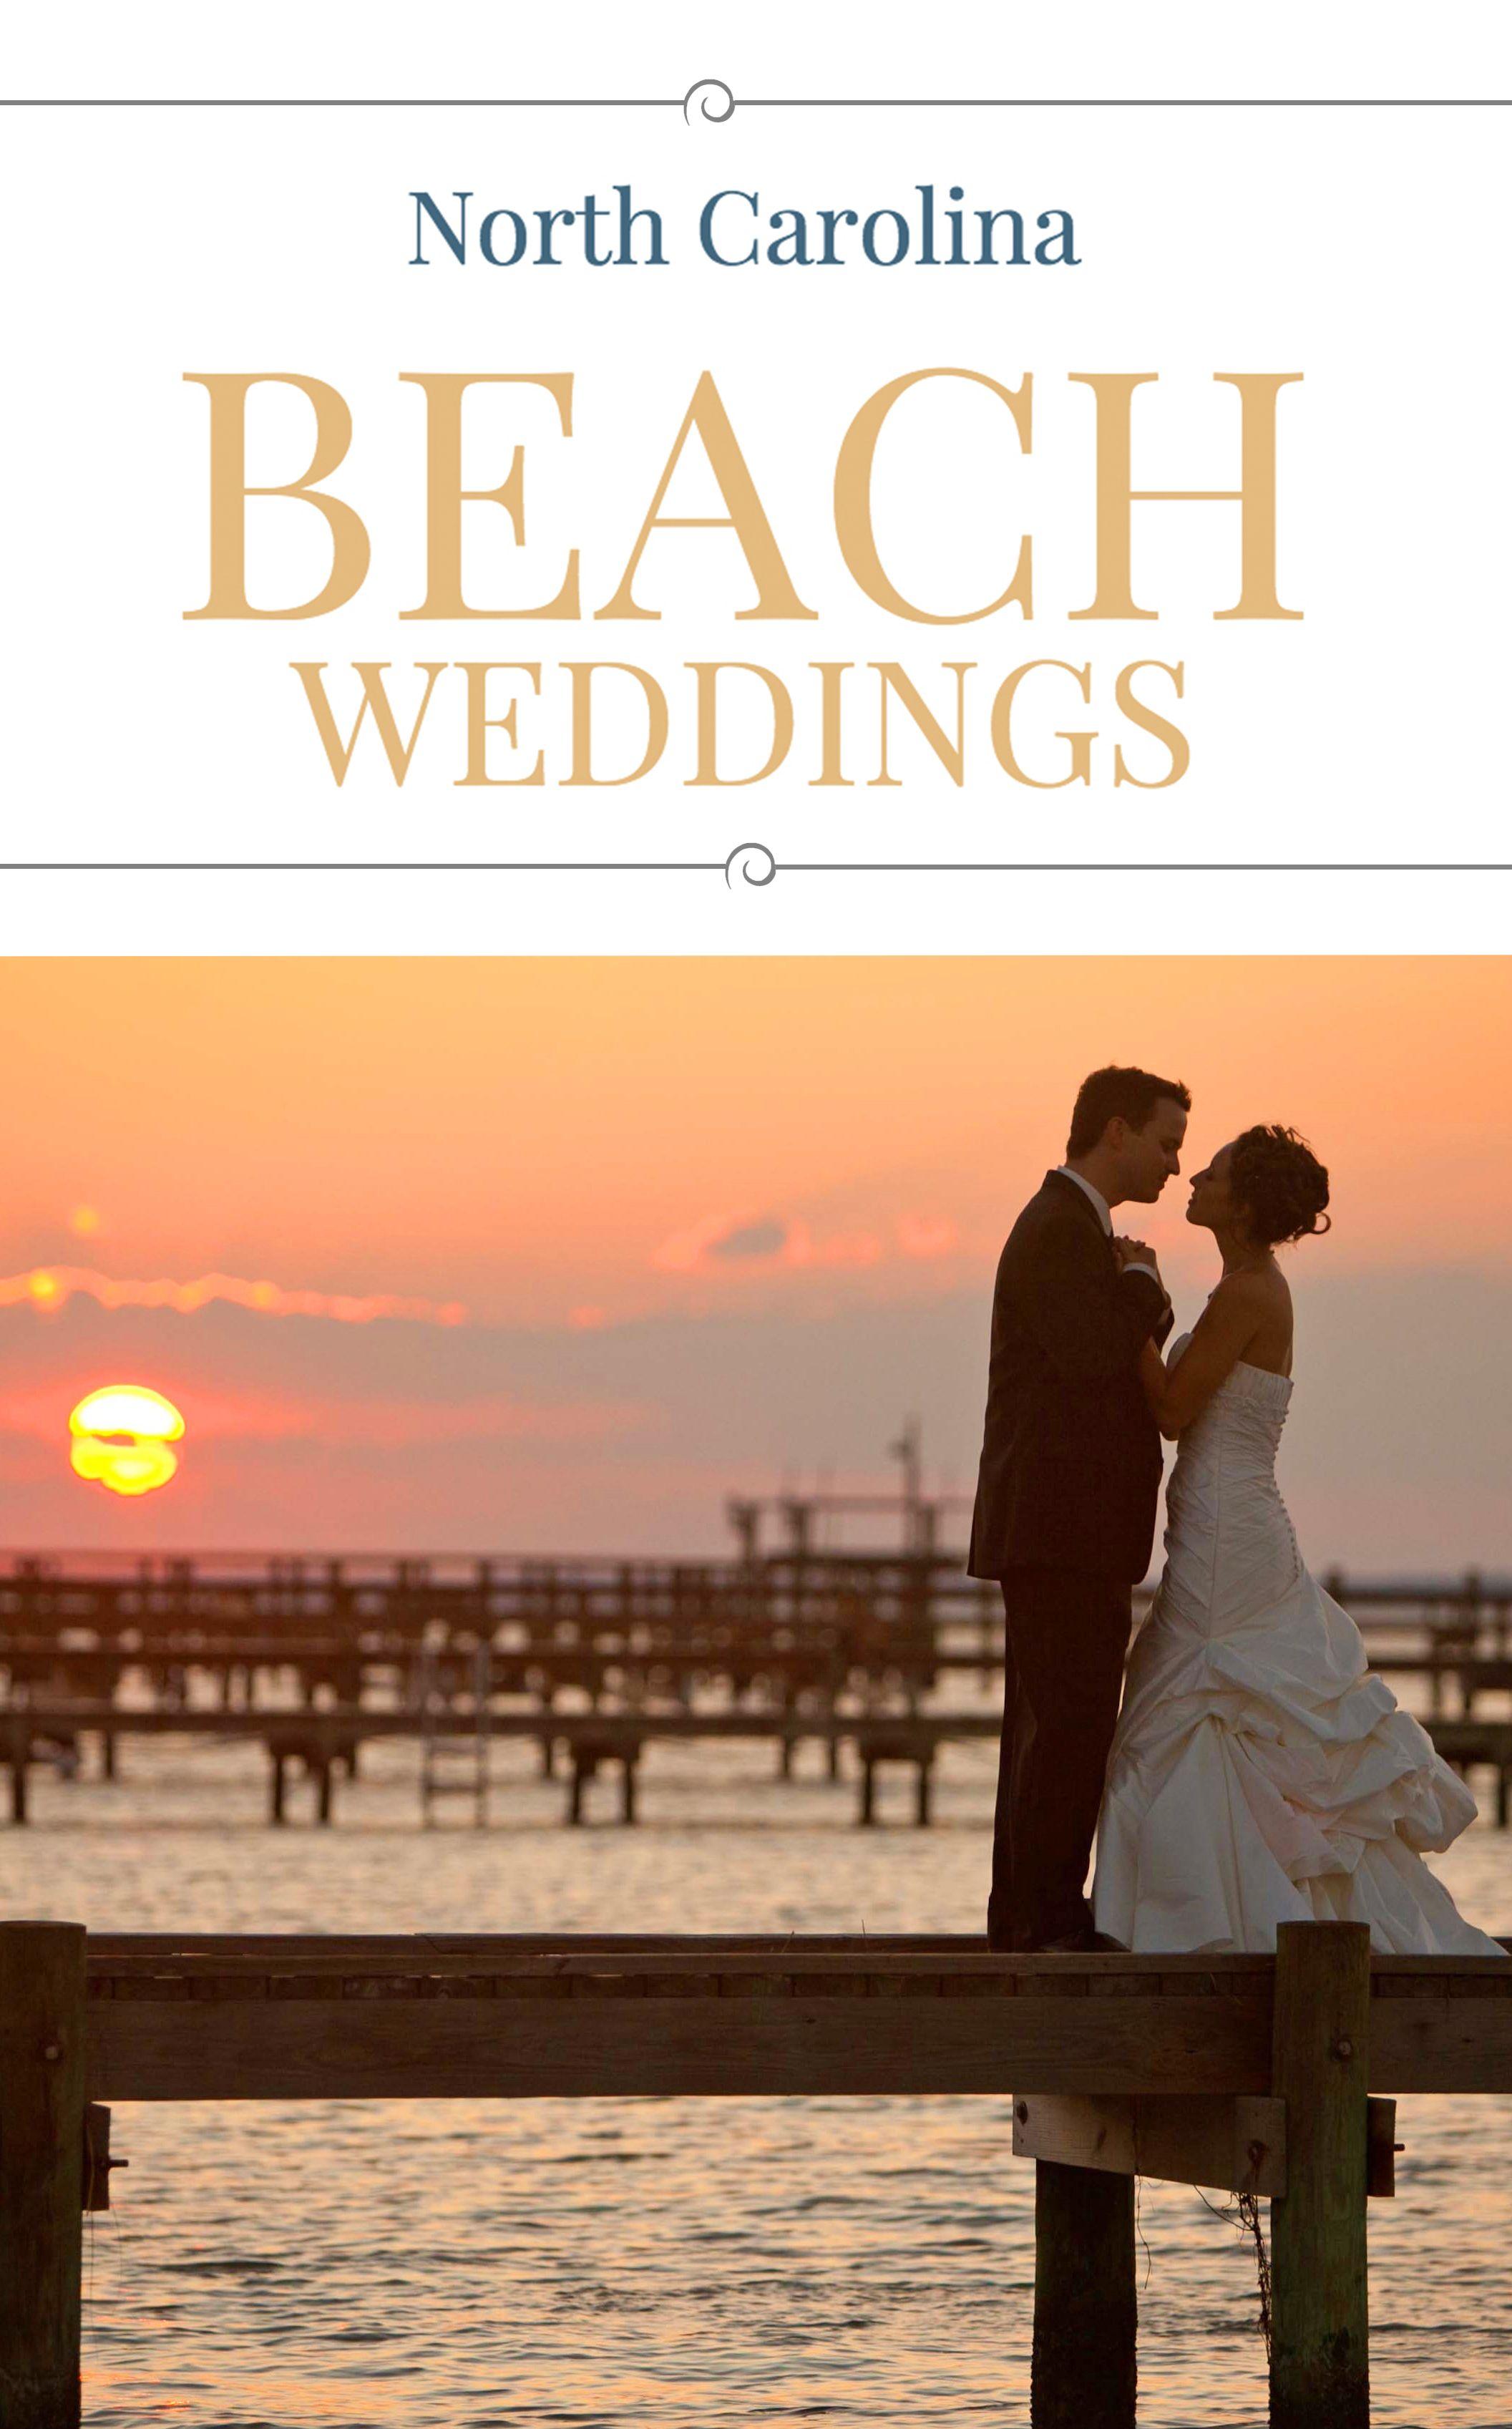 Emerald Isle Weddings Beach Weddings On North Carolina S Crystal Coast North Carolina Wedding Beach Wedding Venues North Carolina North Carolina Beaches